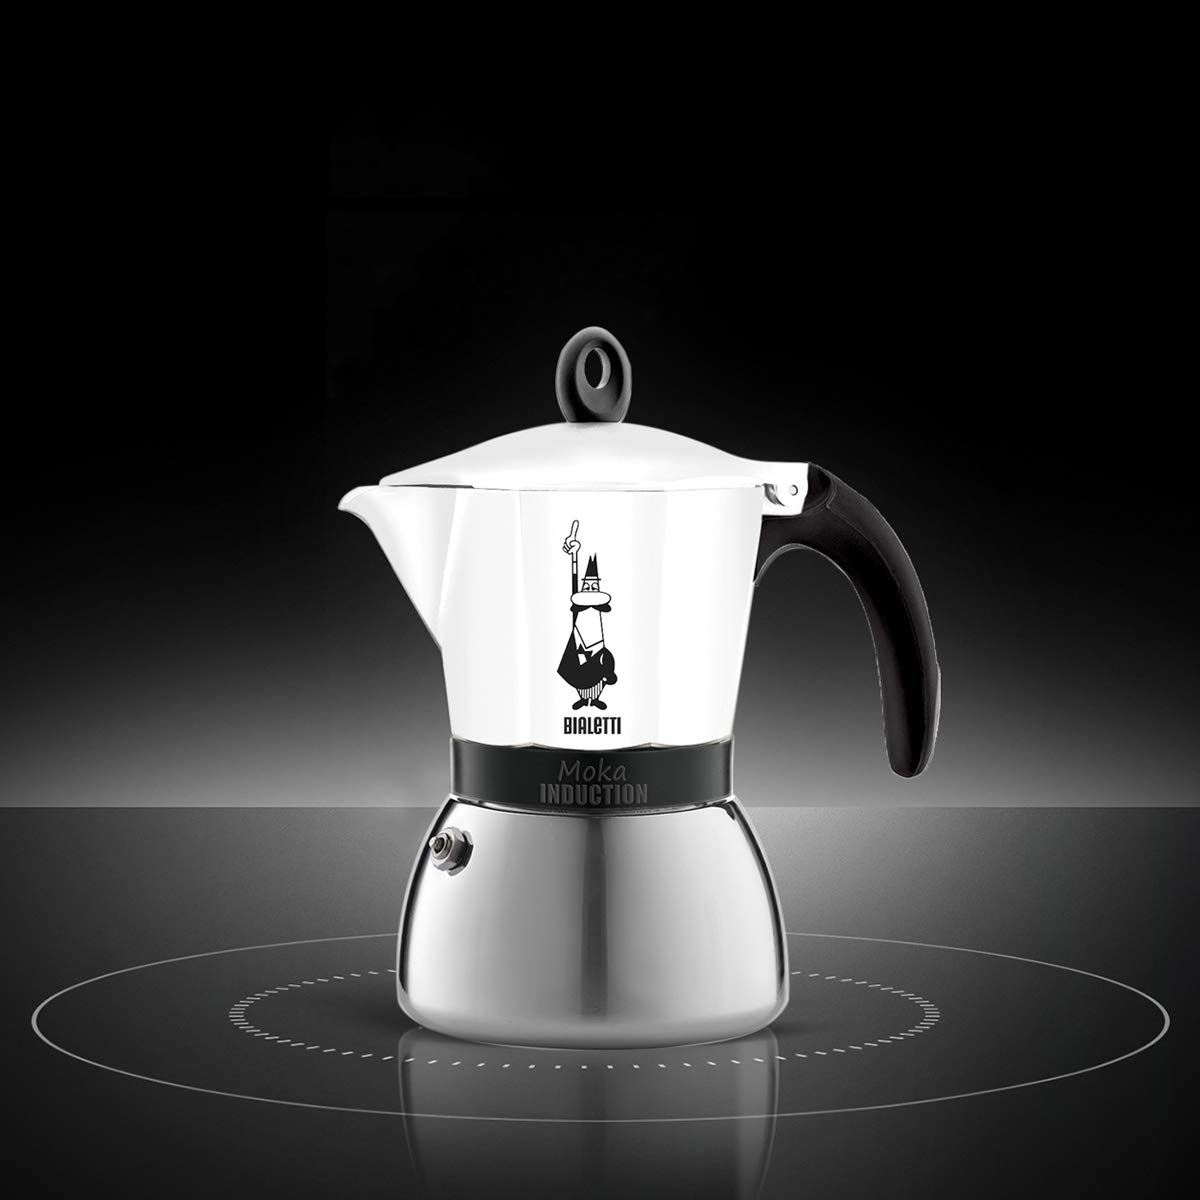 Bialetti Moka Induction, cafetera con base de acero para inducción, color blanco 6 tazas